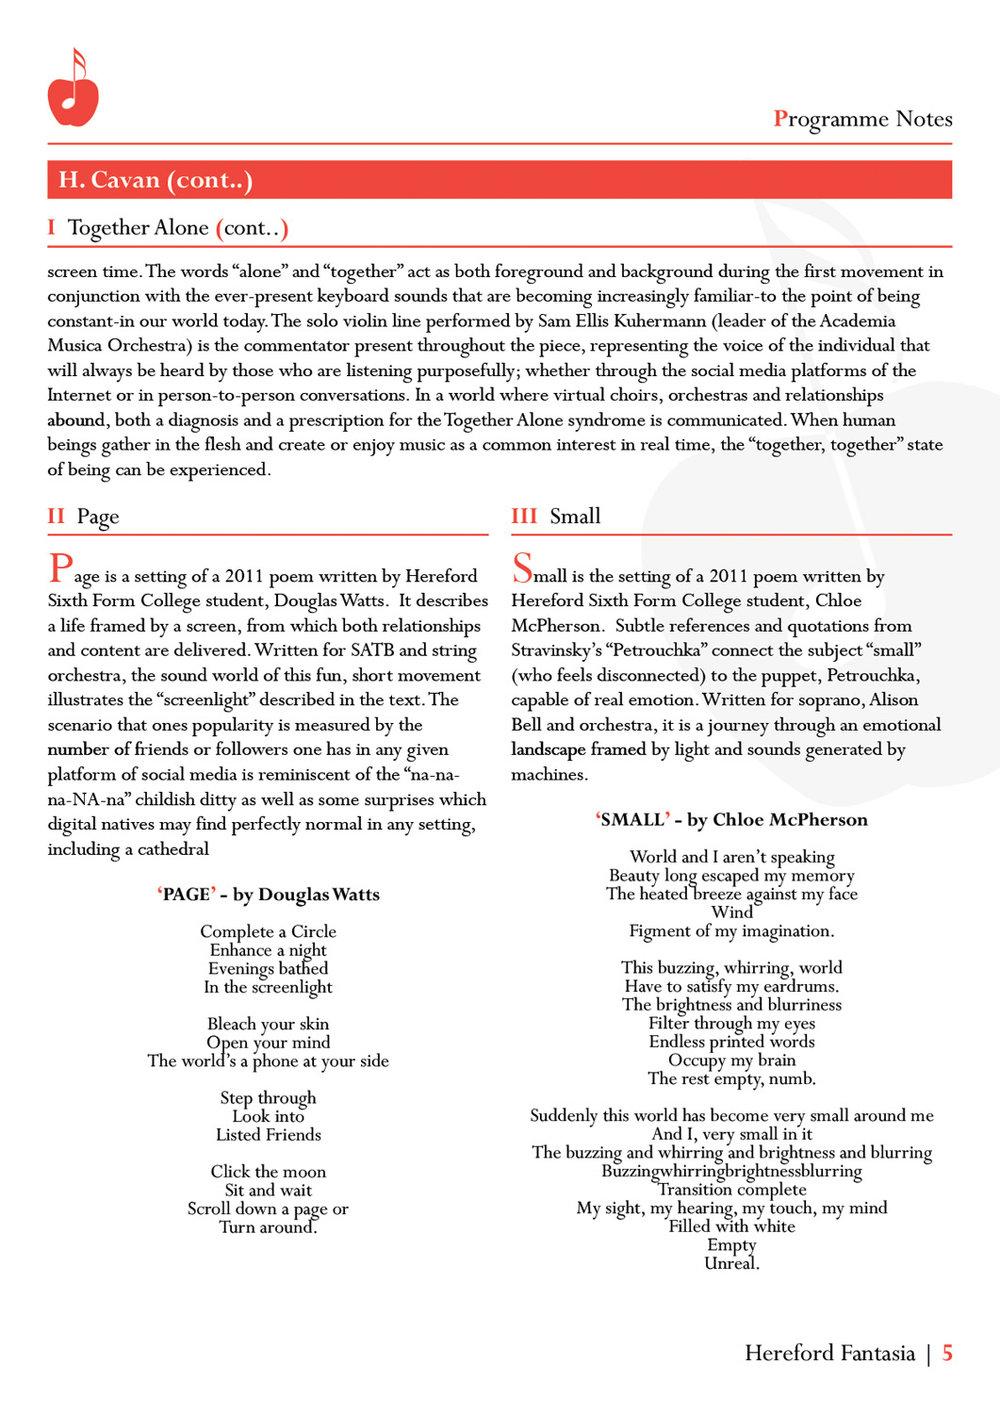 Hereford-Programme-7.jpg